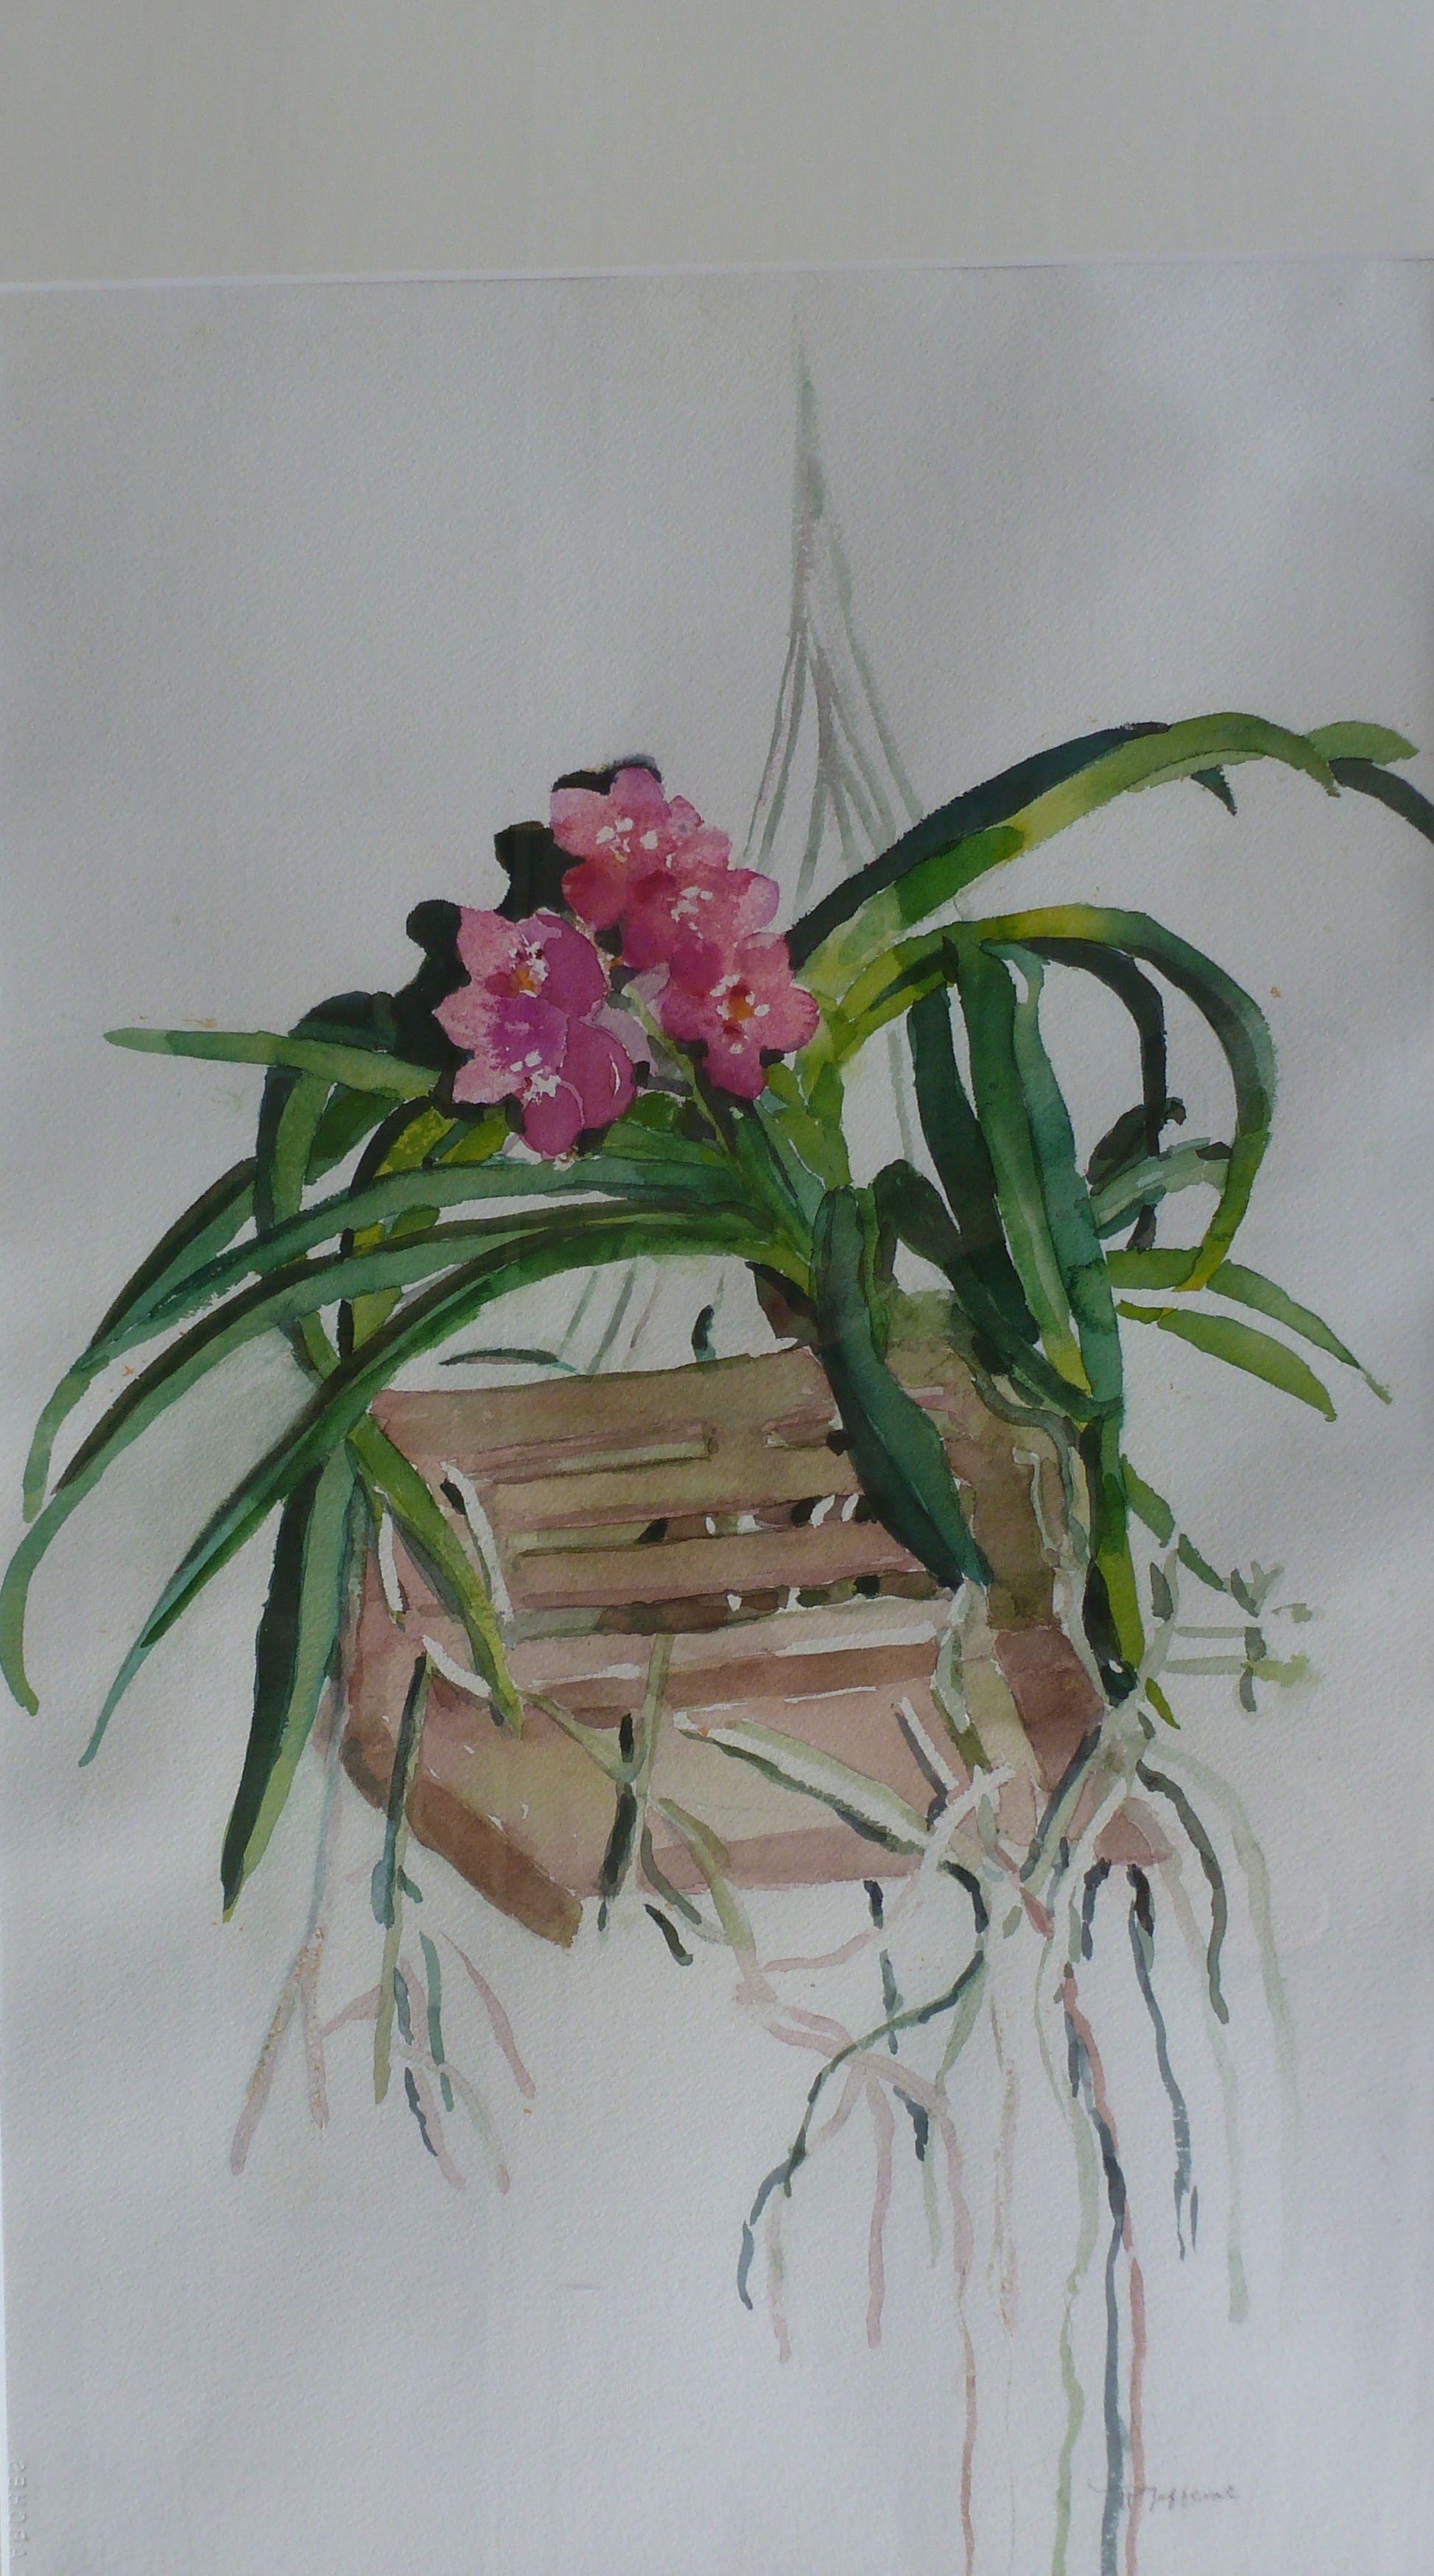 Vanda Orchids  Watercolor  Framed  28hx22w  $300